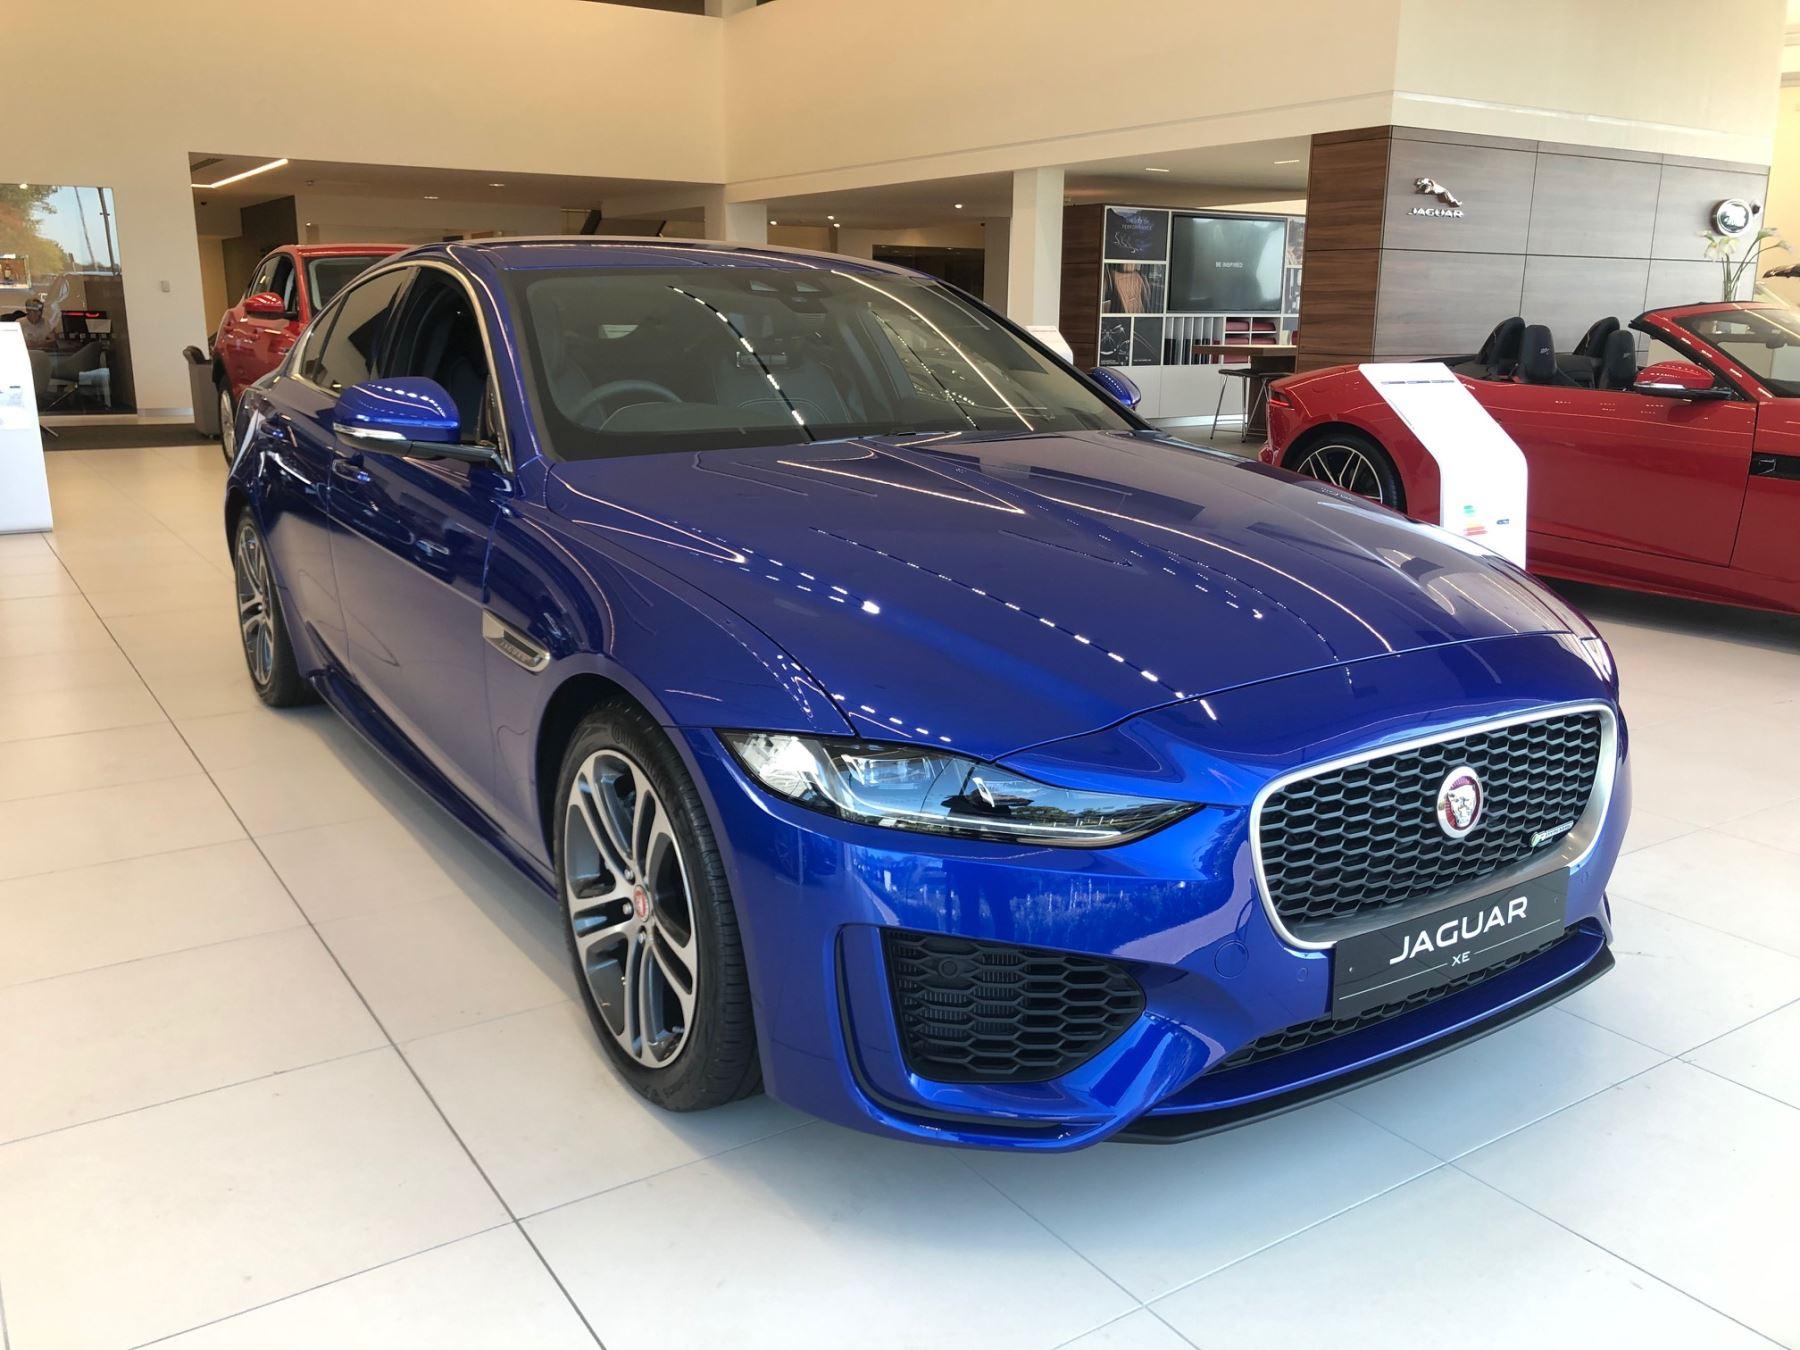 Jaguar XE 2.0 R-Dynamic SE image 1